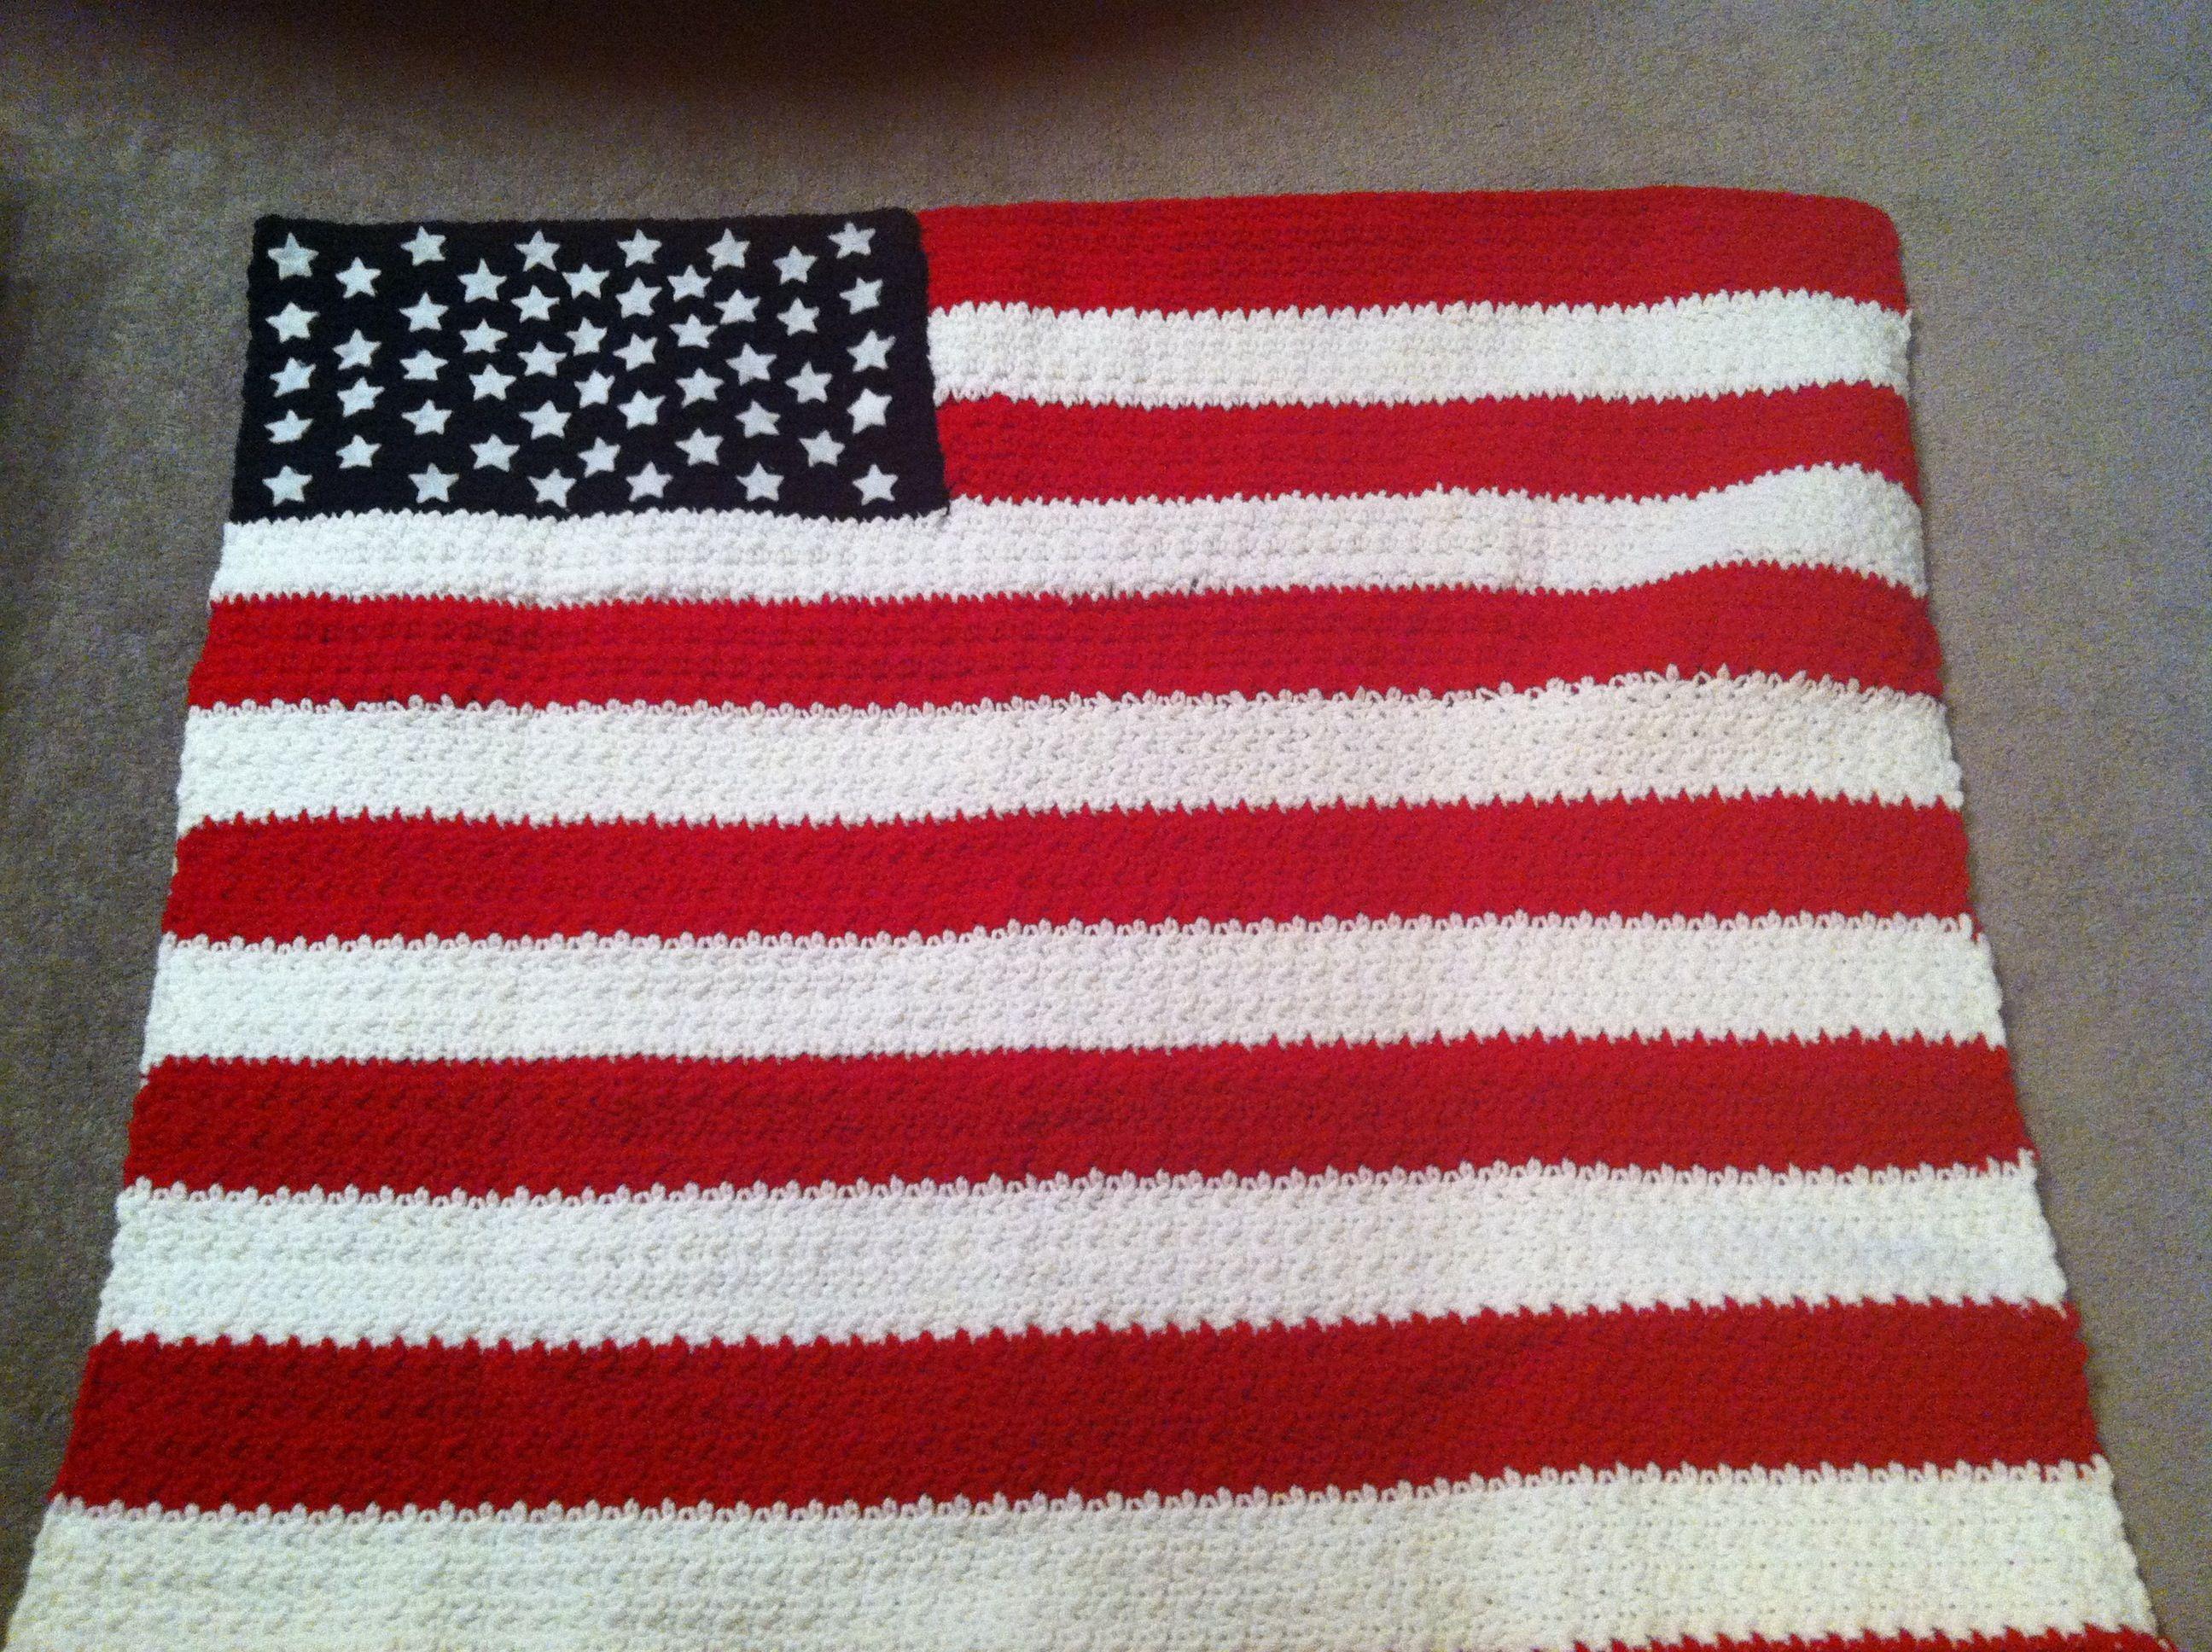 Crochet Pattern For Usa Flag : Crocheted American Flag 4th of July Pinterest